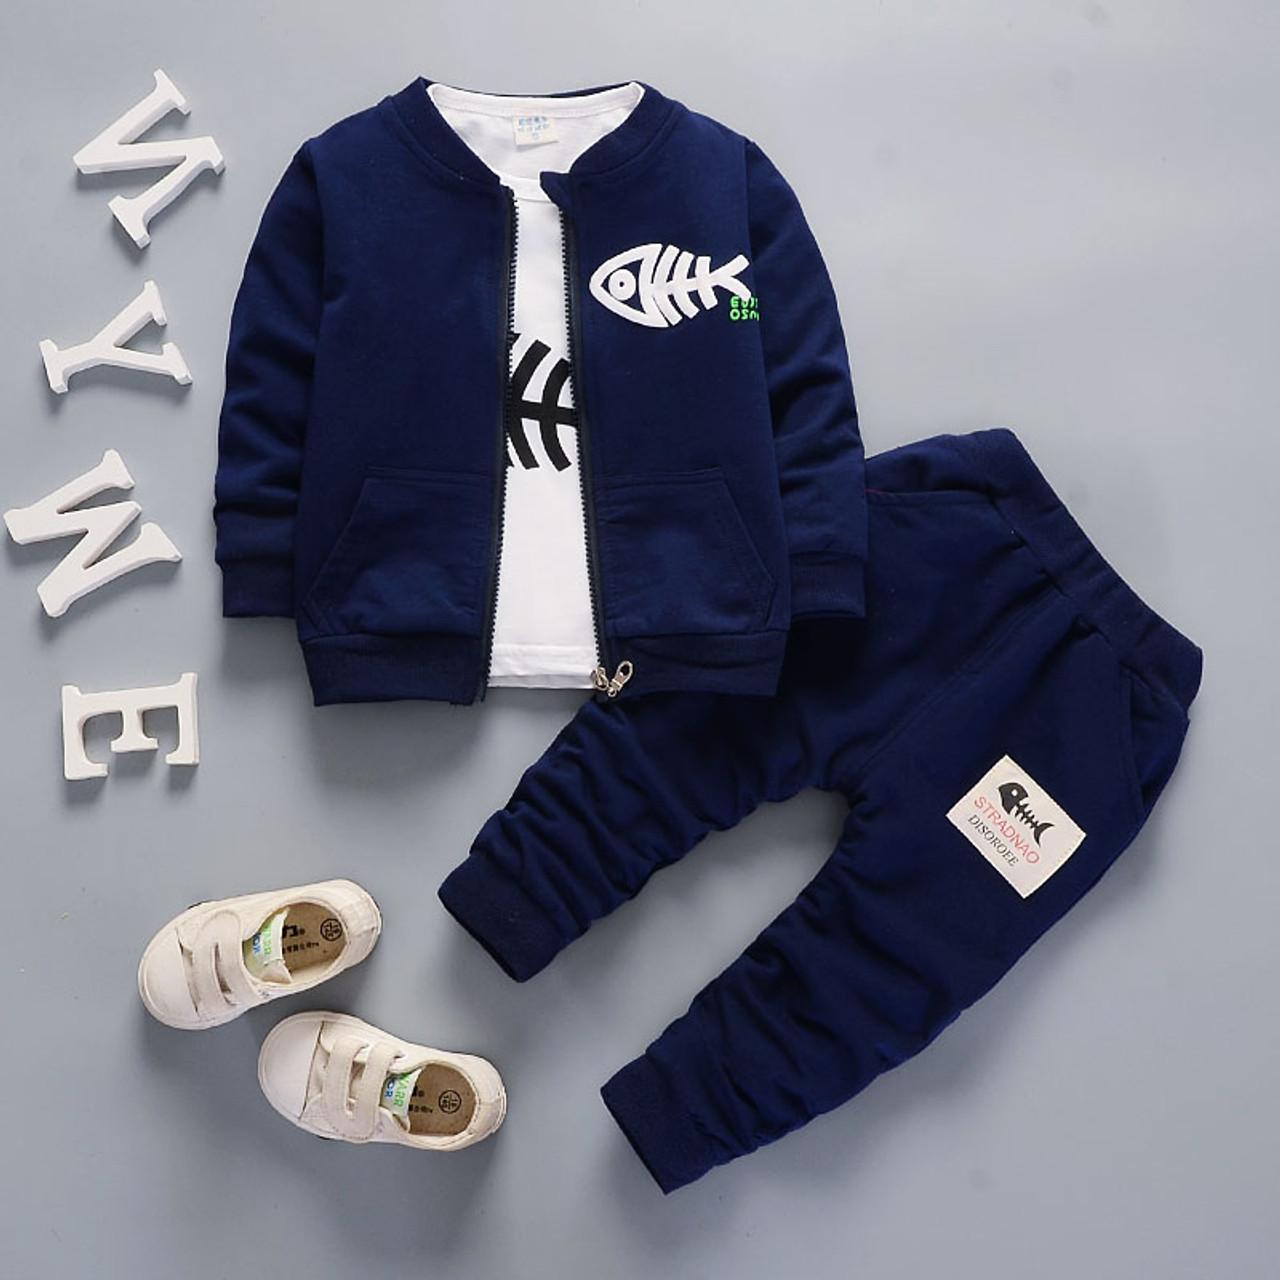 ec234e3cb493a ... Bibicola baby boys clothing set toddler bebe coat jacket+ T shirt+pants  3 pcs newborn ...